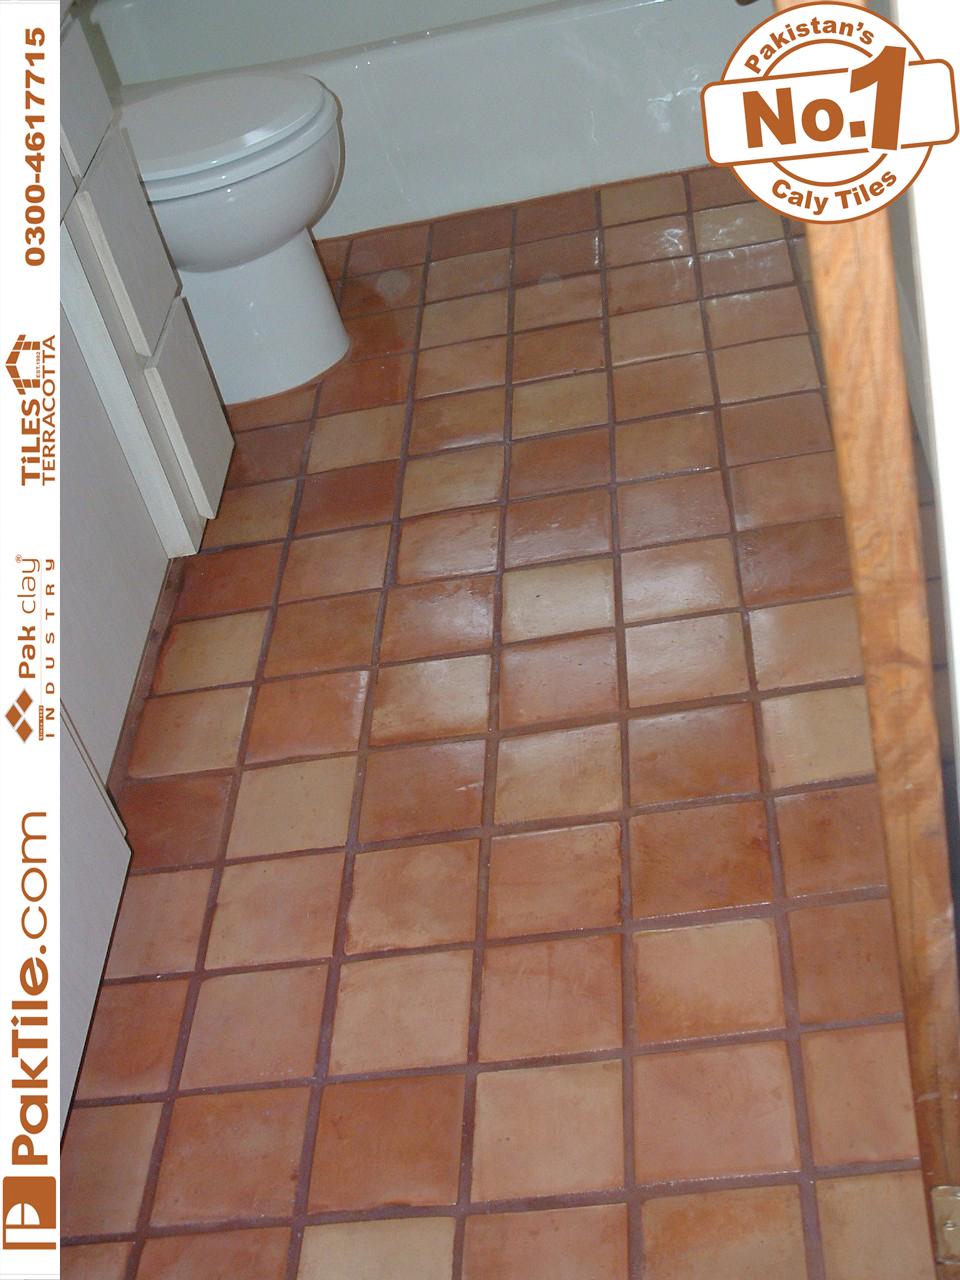 5 Pak Clay Tiles Rawalpindi Bathroom Floor Tiles Design in Pakistan Images.